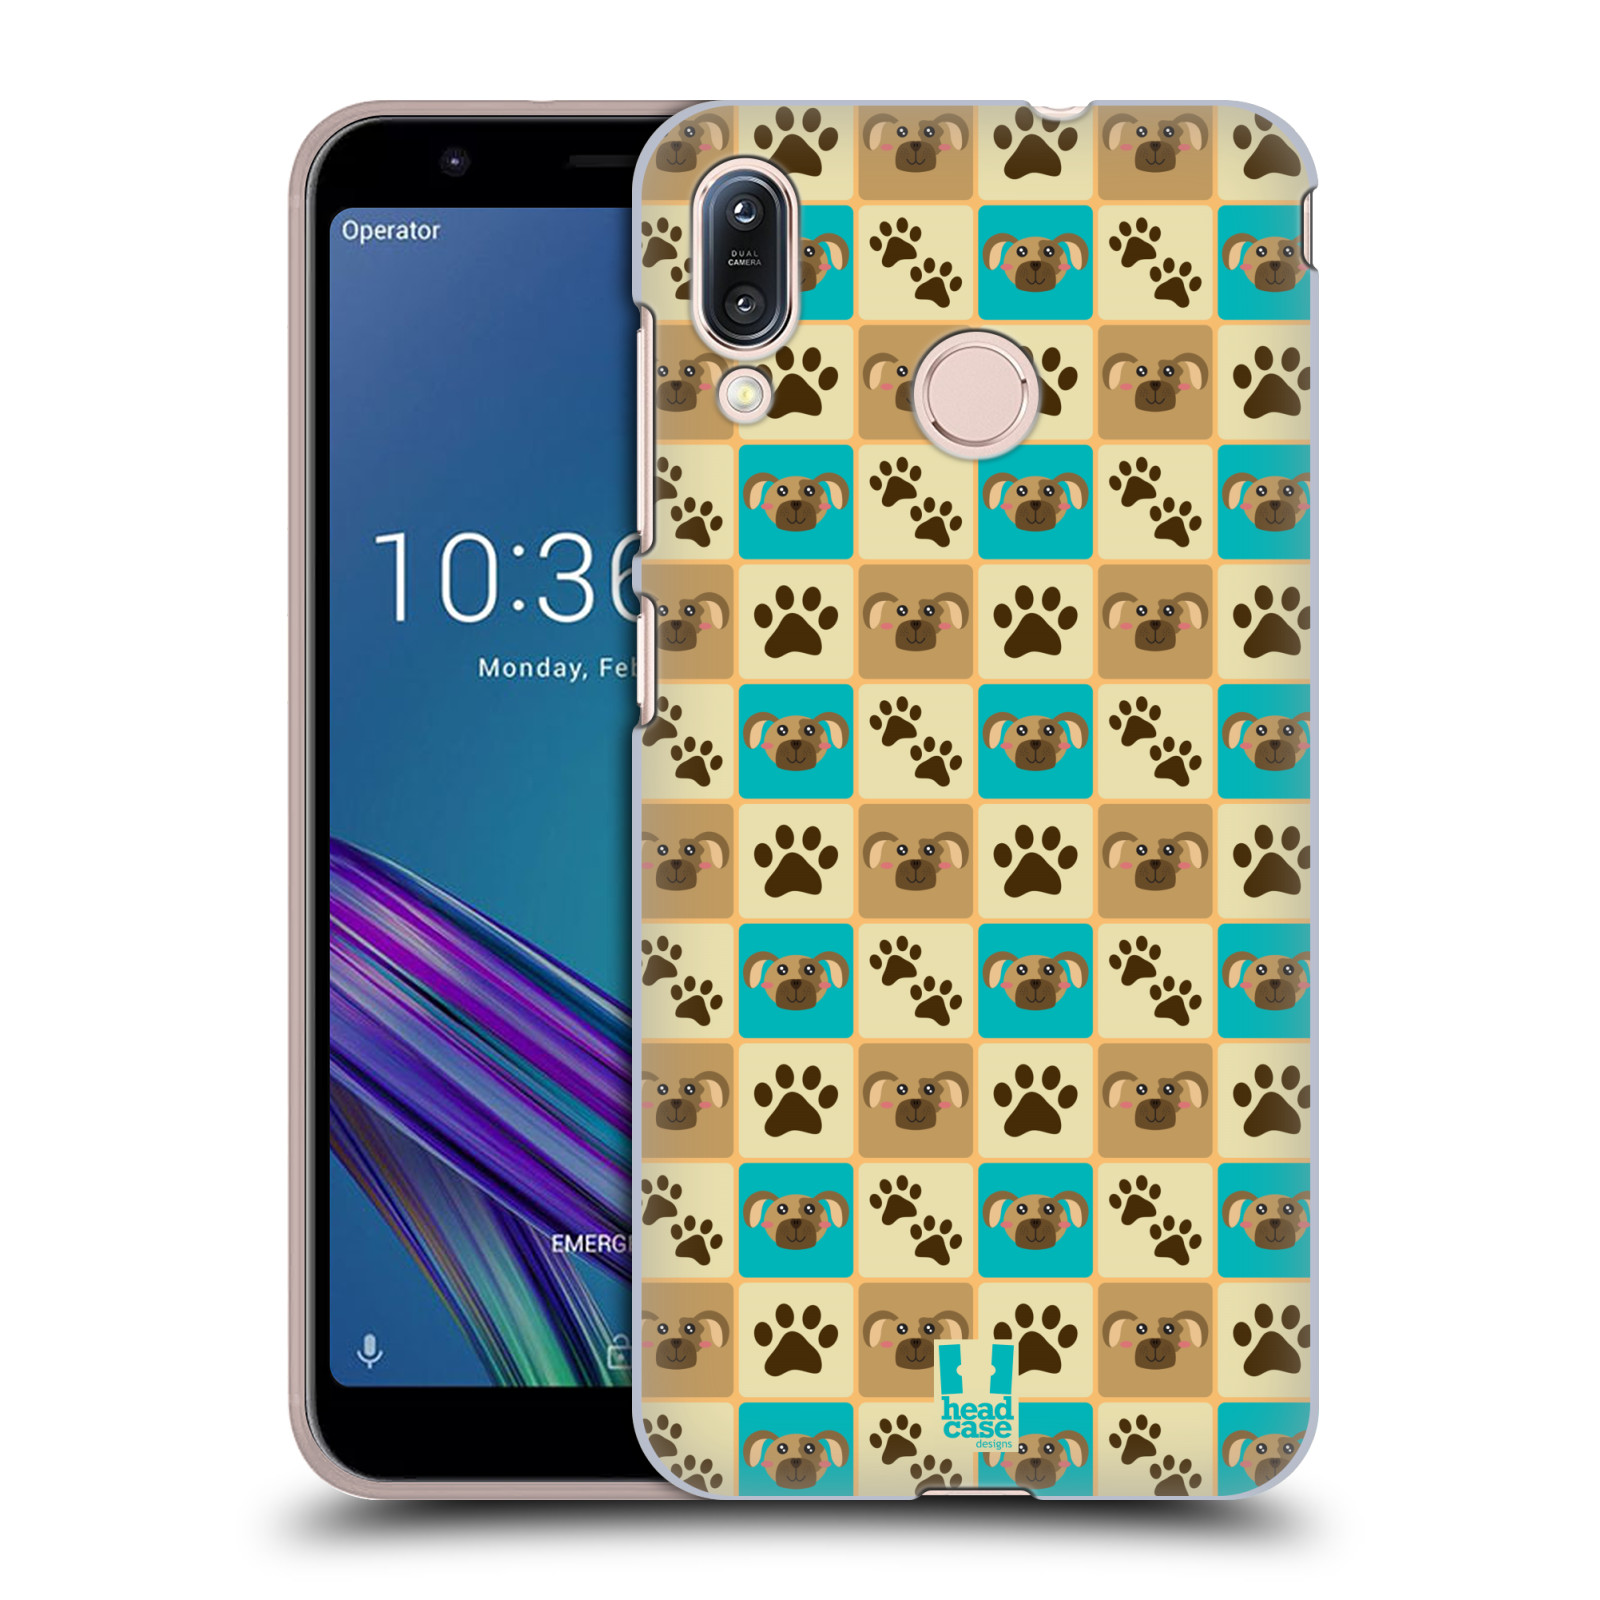 Pouzdro na mobil Asus Zenfone Max M1 (ZB555KL) - HEAD CASE - vzor Zvířecí razítka PSÍ TLAPKA